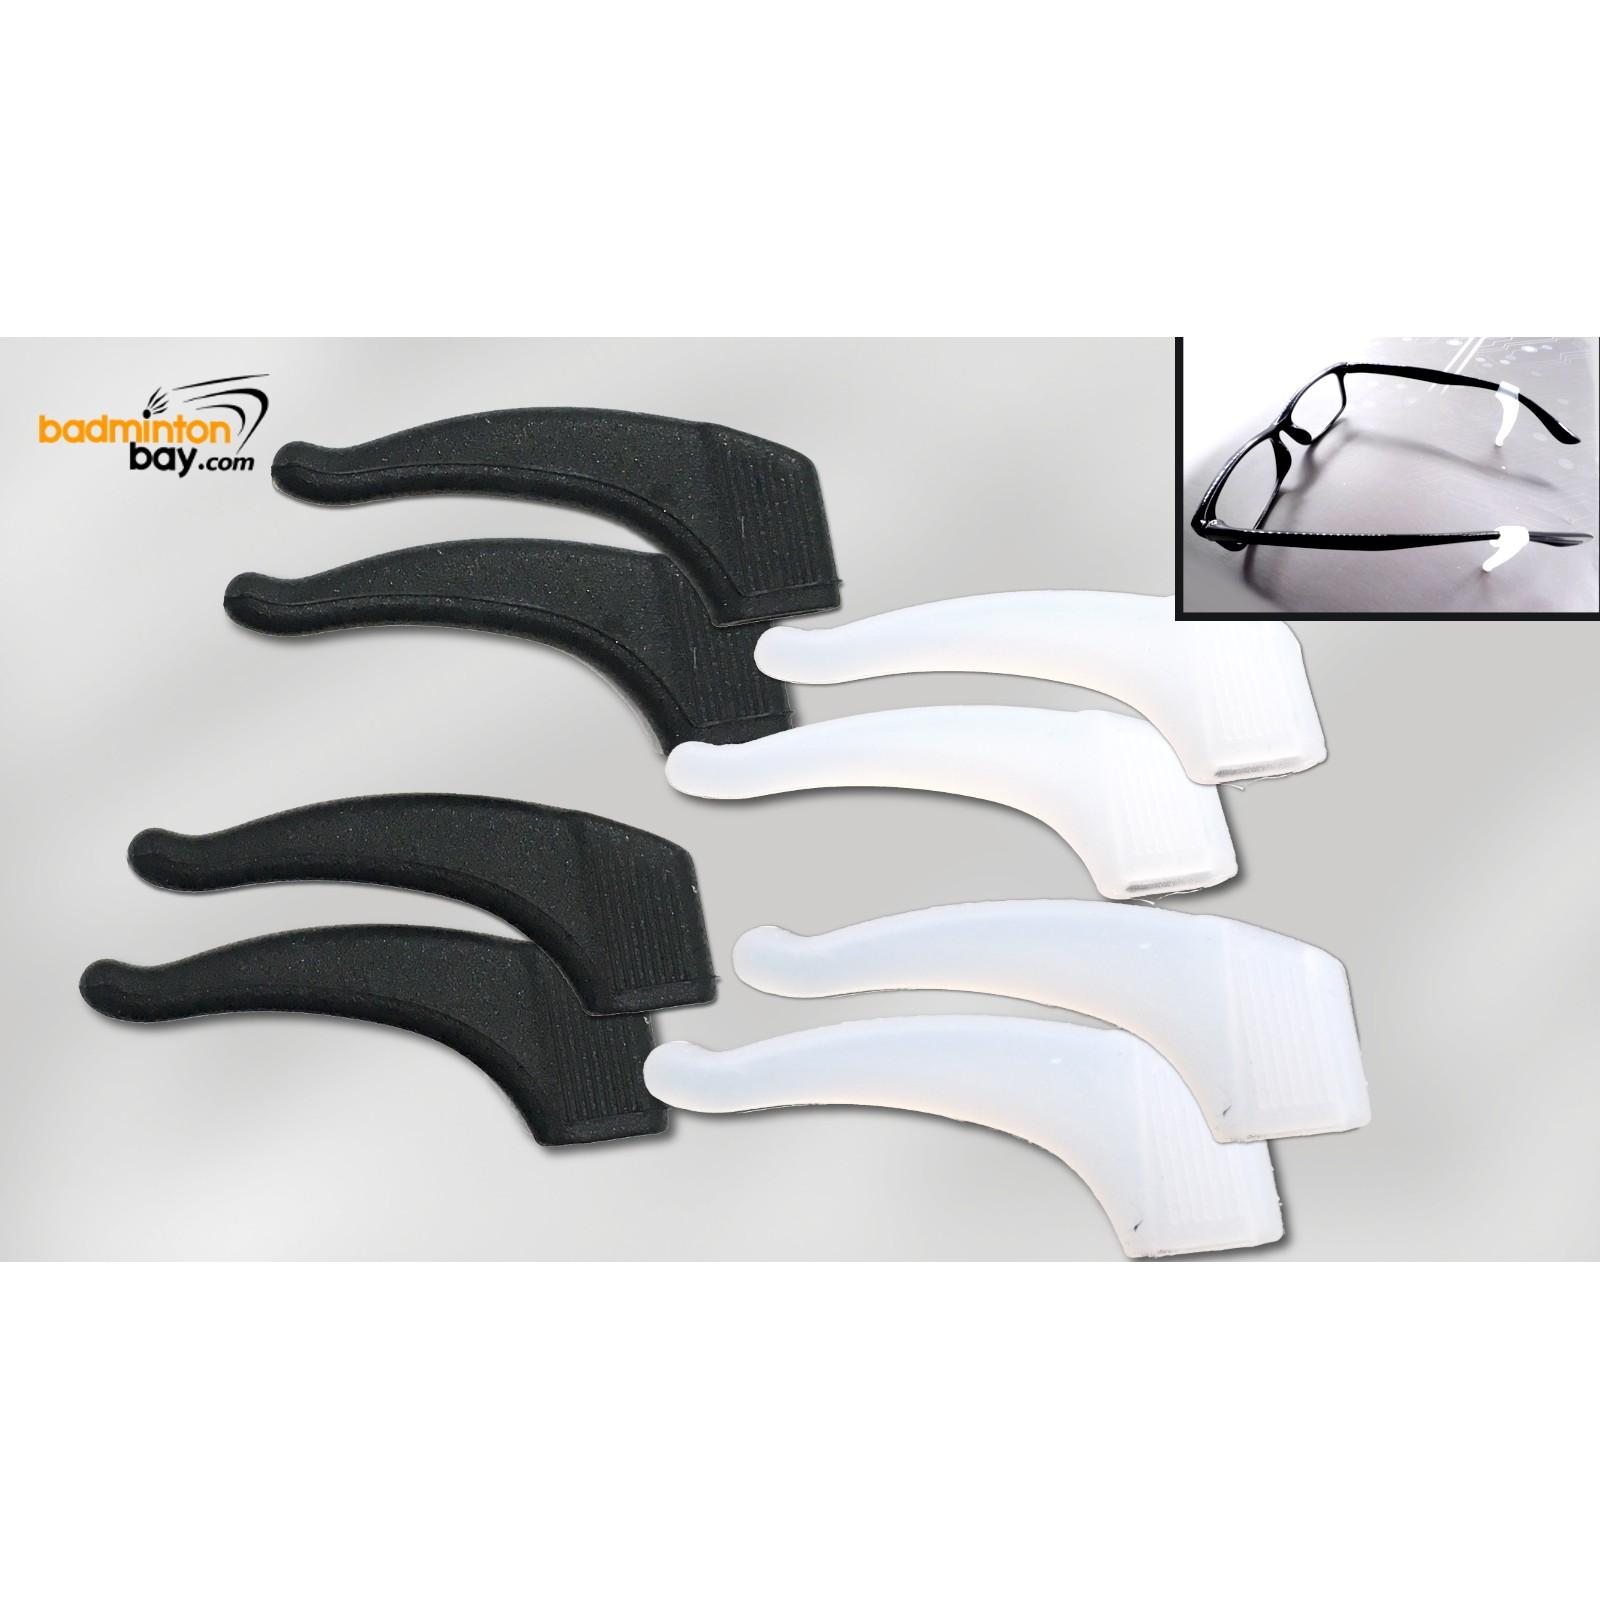 6535fa92f0eb Abroz Sports Silicone Eye Glasses Ear Hooks Grip Anti Slip Temple Tips